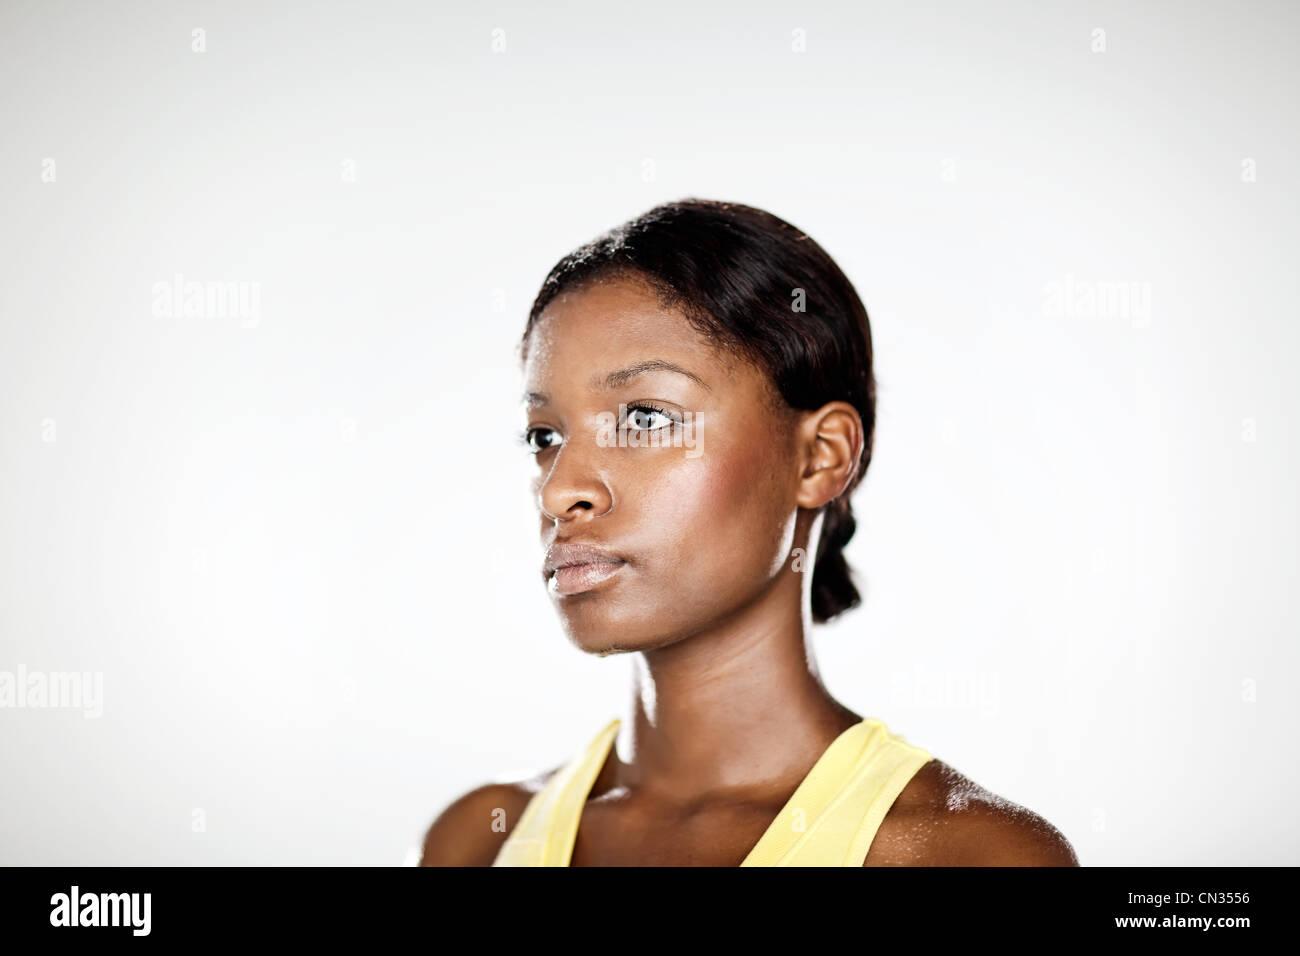 Female athlete, portrait - Stock Image